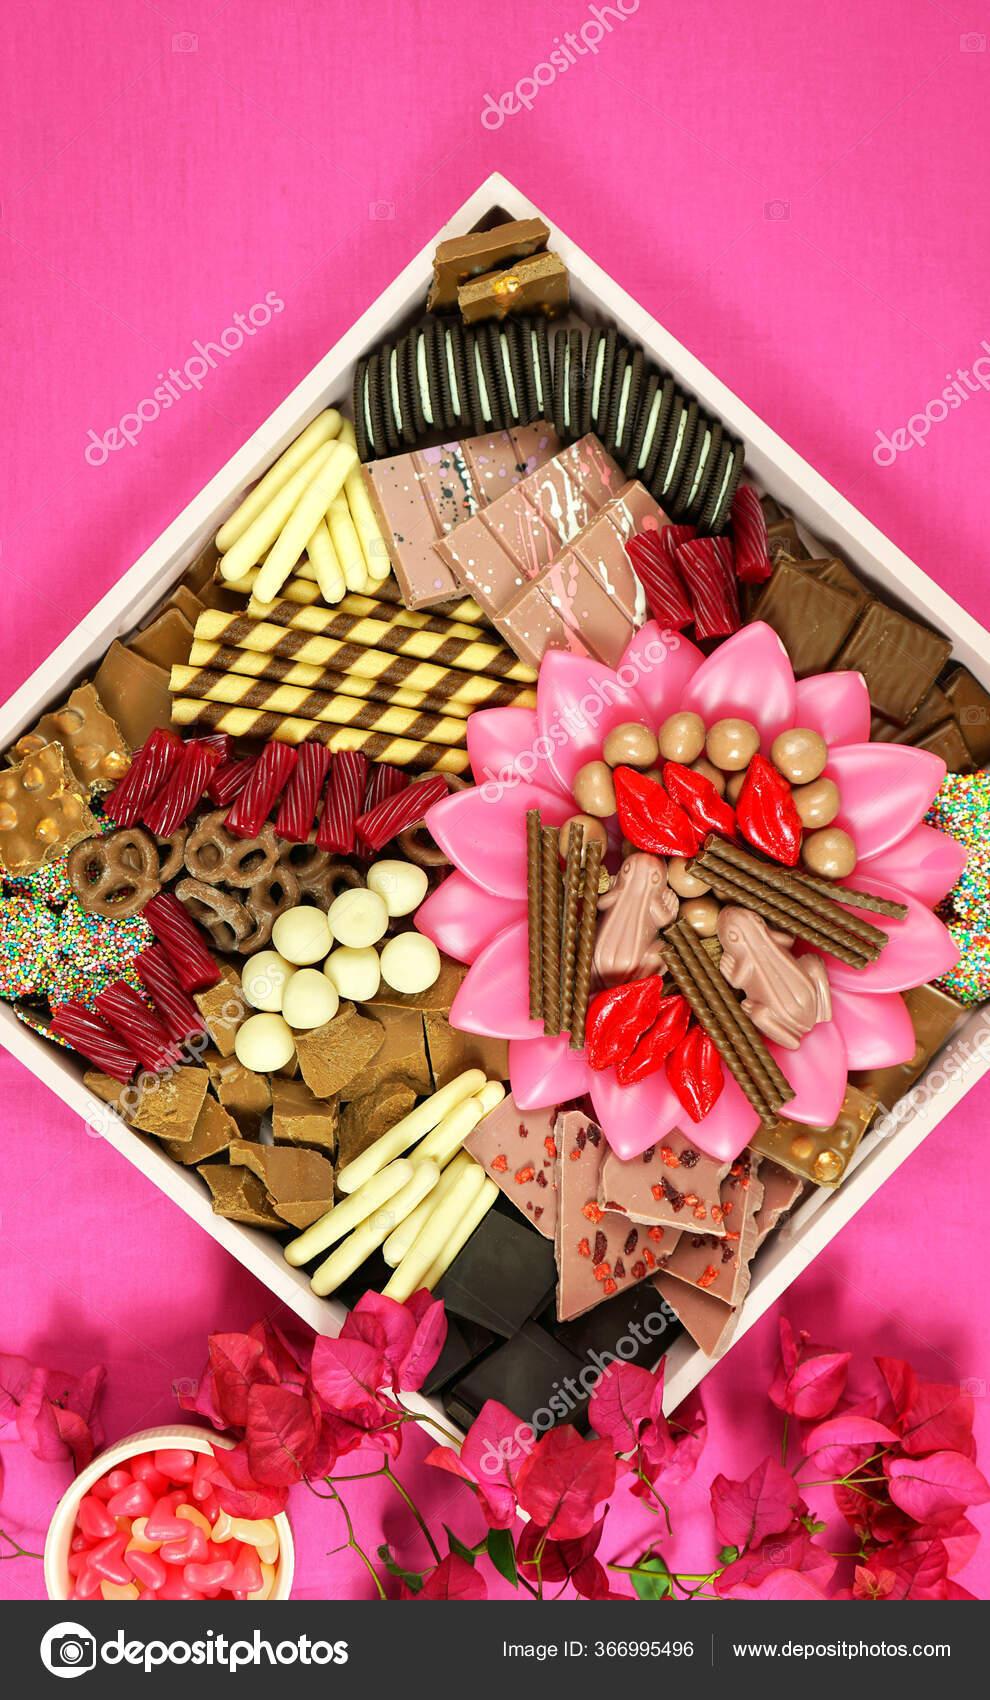 Chocolate Dessert Charcuterie Grazing Platter Tray On Modern Pink Background Stock Photo C Amarosy 366995496